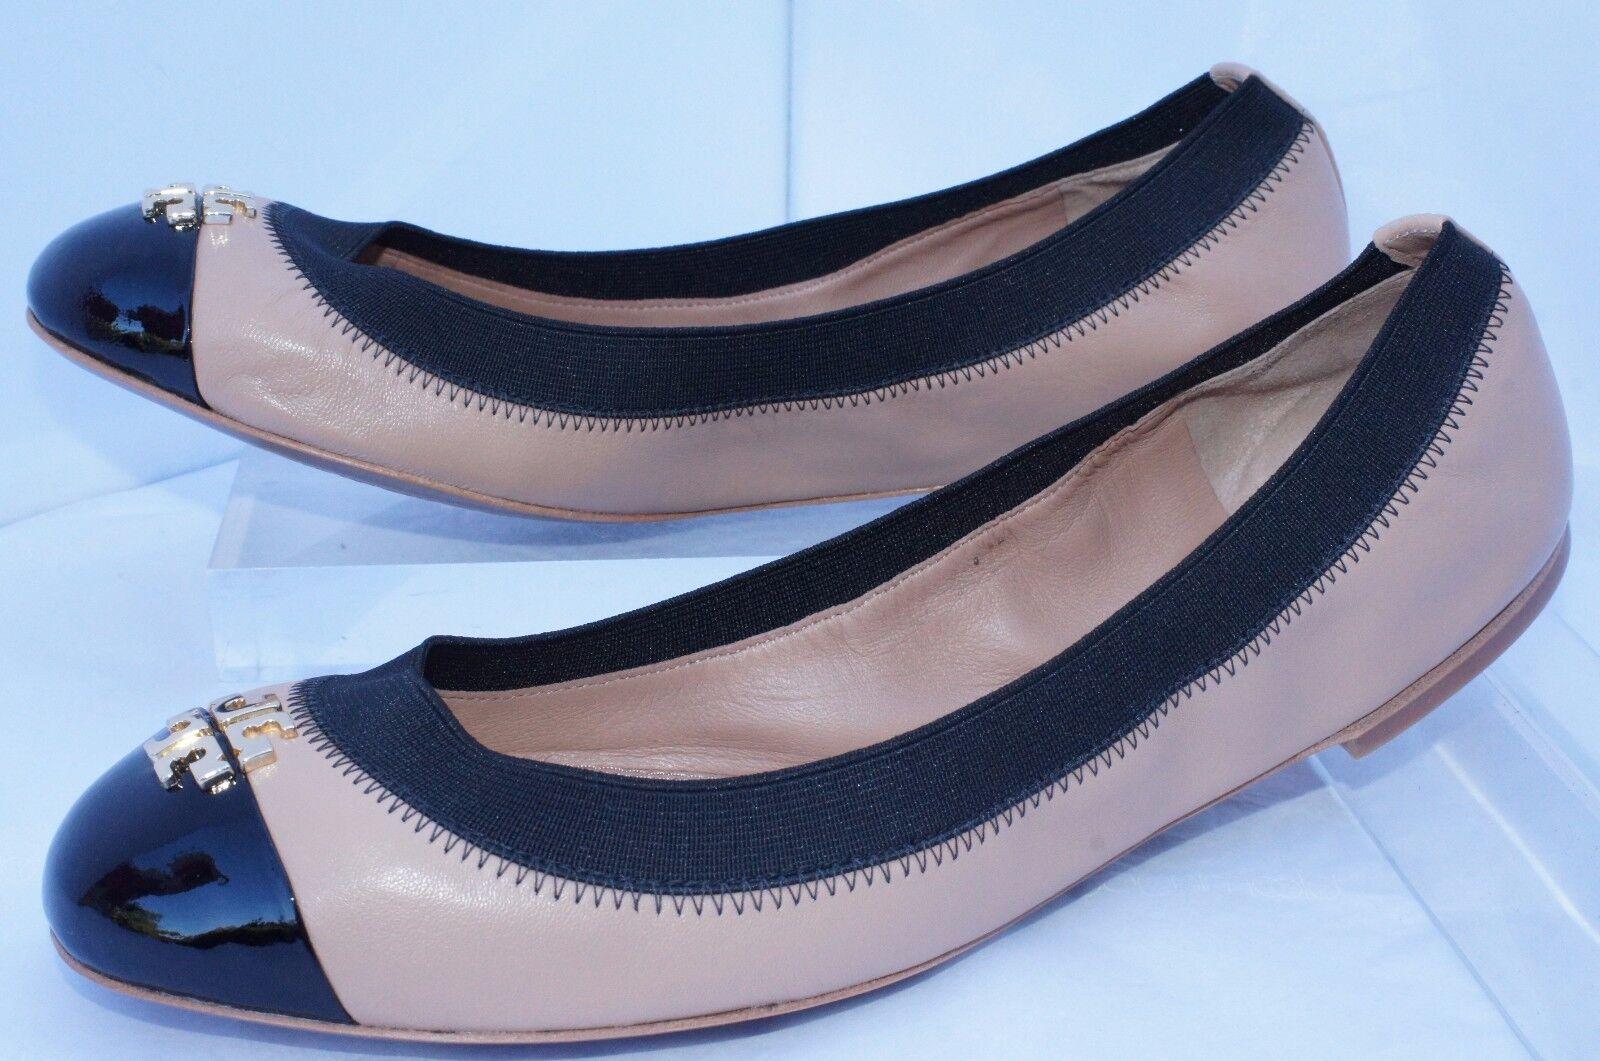 New Tory Burch Jolie Shoes Ballet Flats Beigi Black Size 6.5 Slip Ons Leather